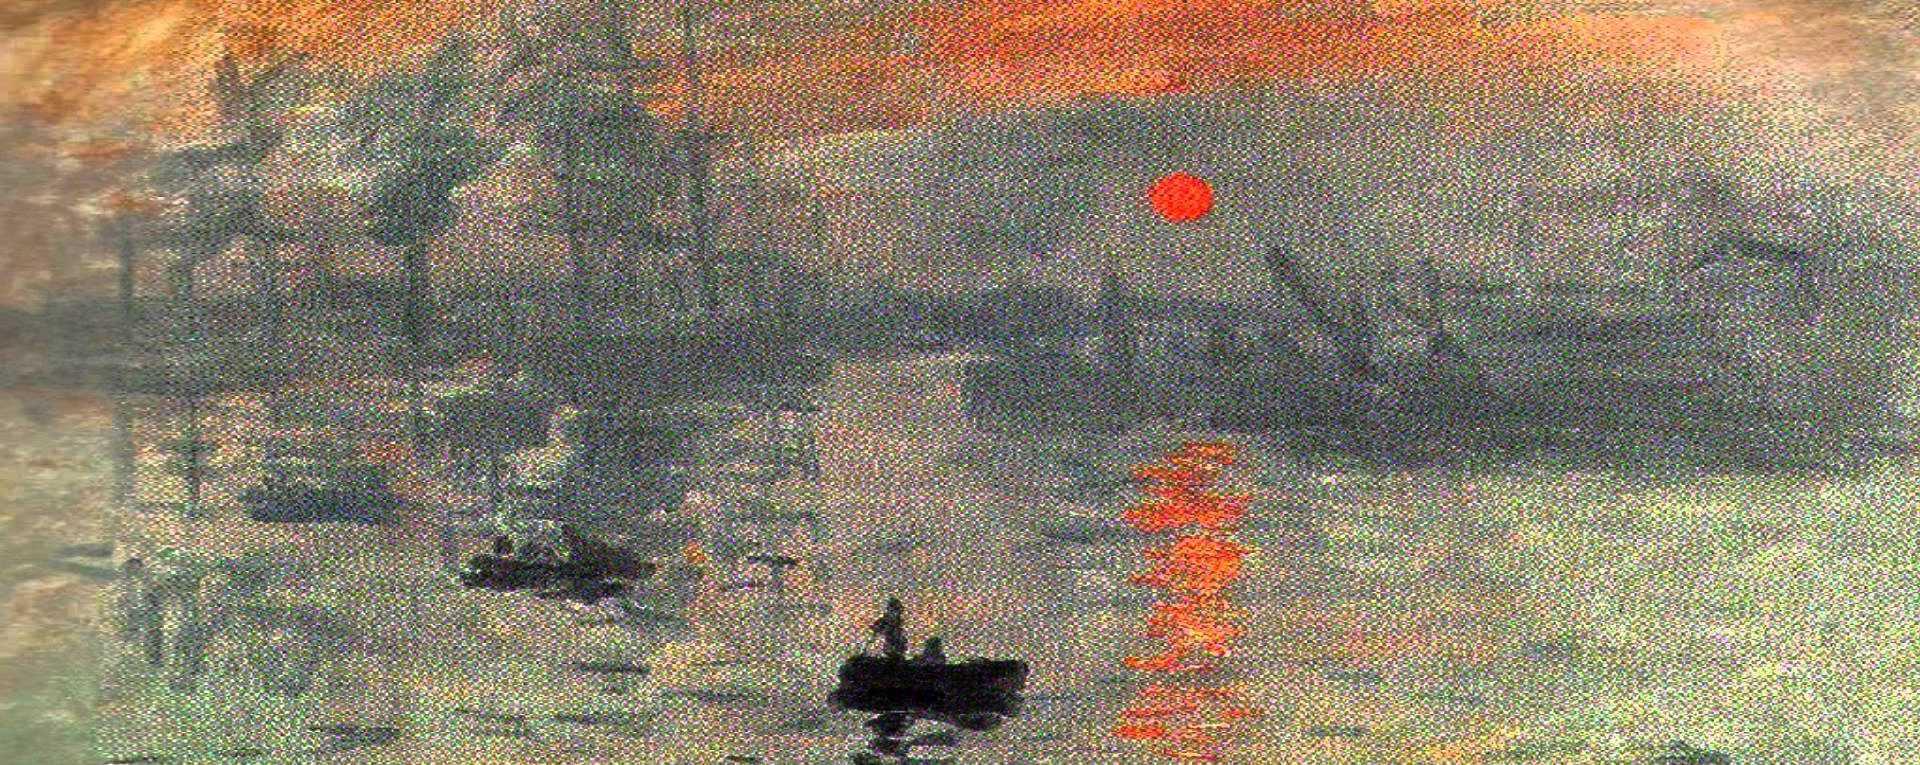 By Claude Monet | Art-Pie